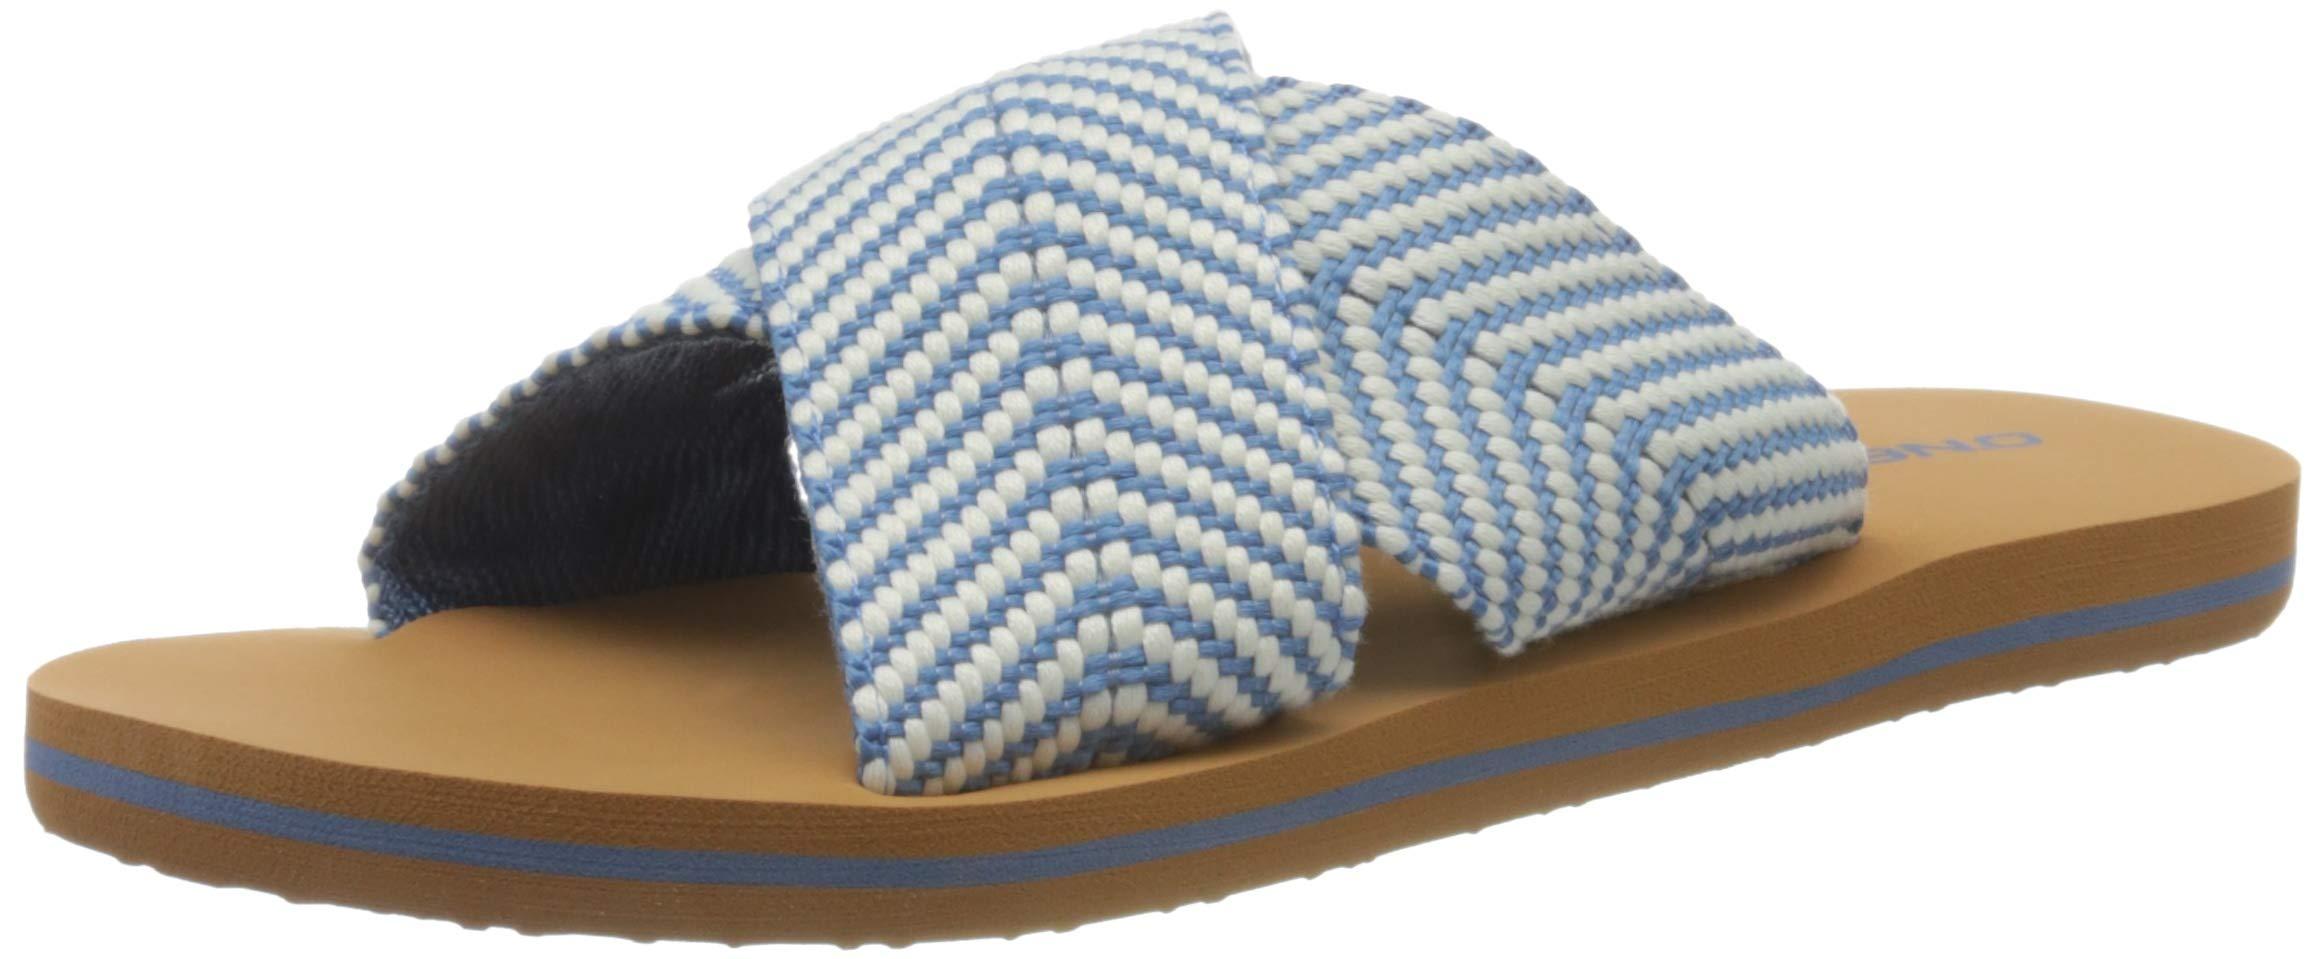 O'Neill Damen Fw Ditsy Slide Sandalen Zehentrenner, Blau (Walton Blue 5209), 36